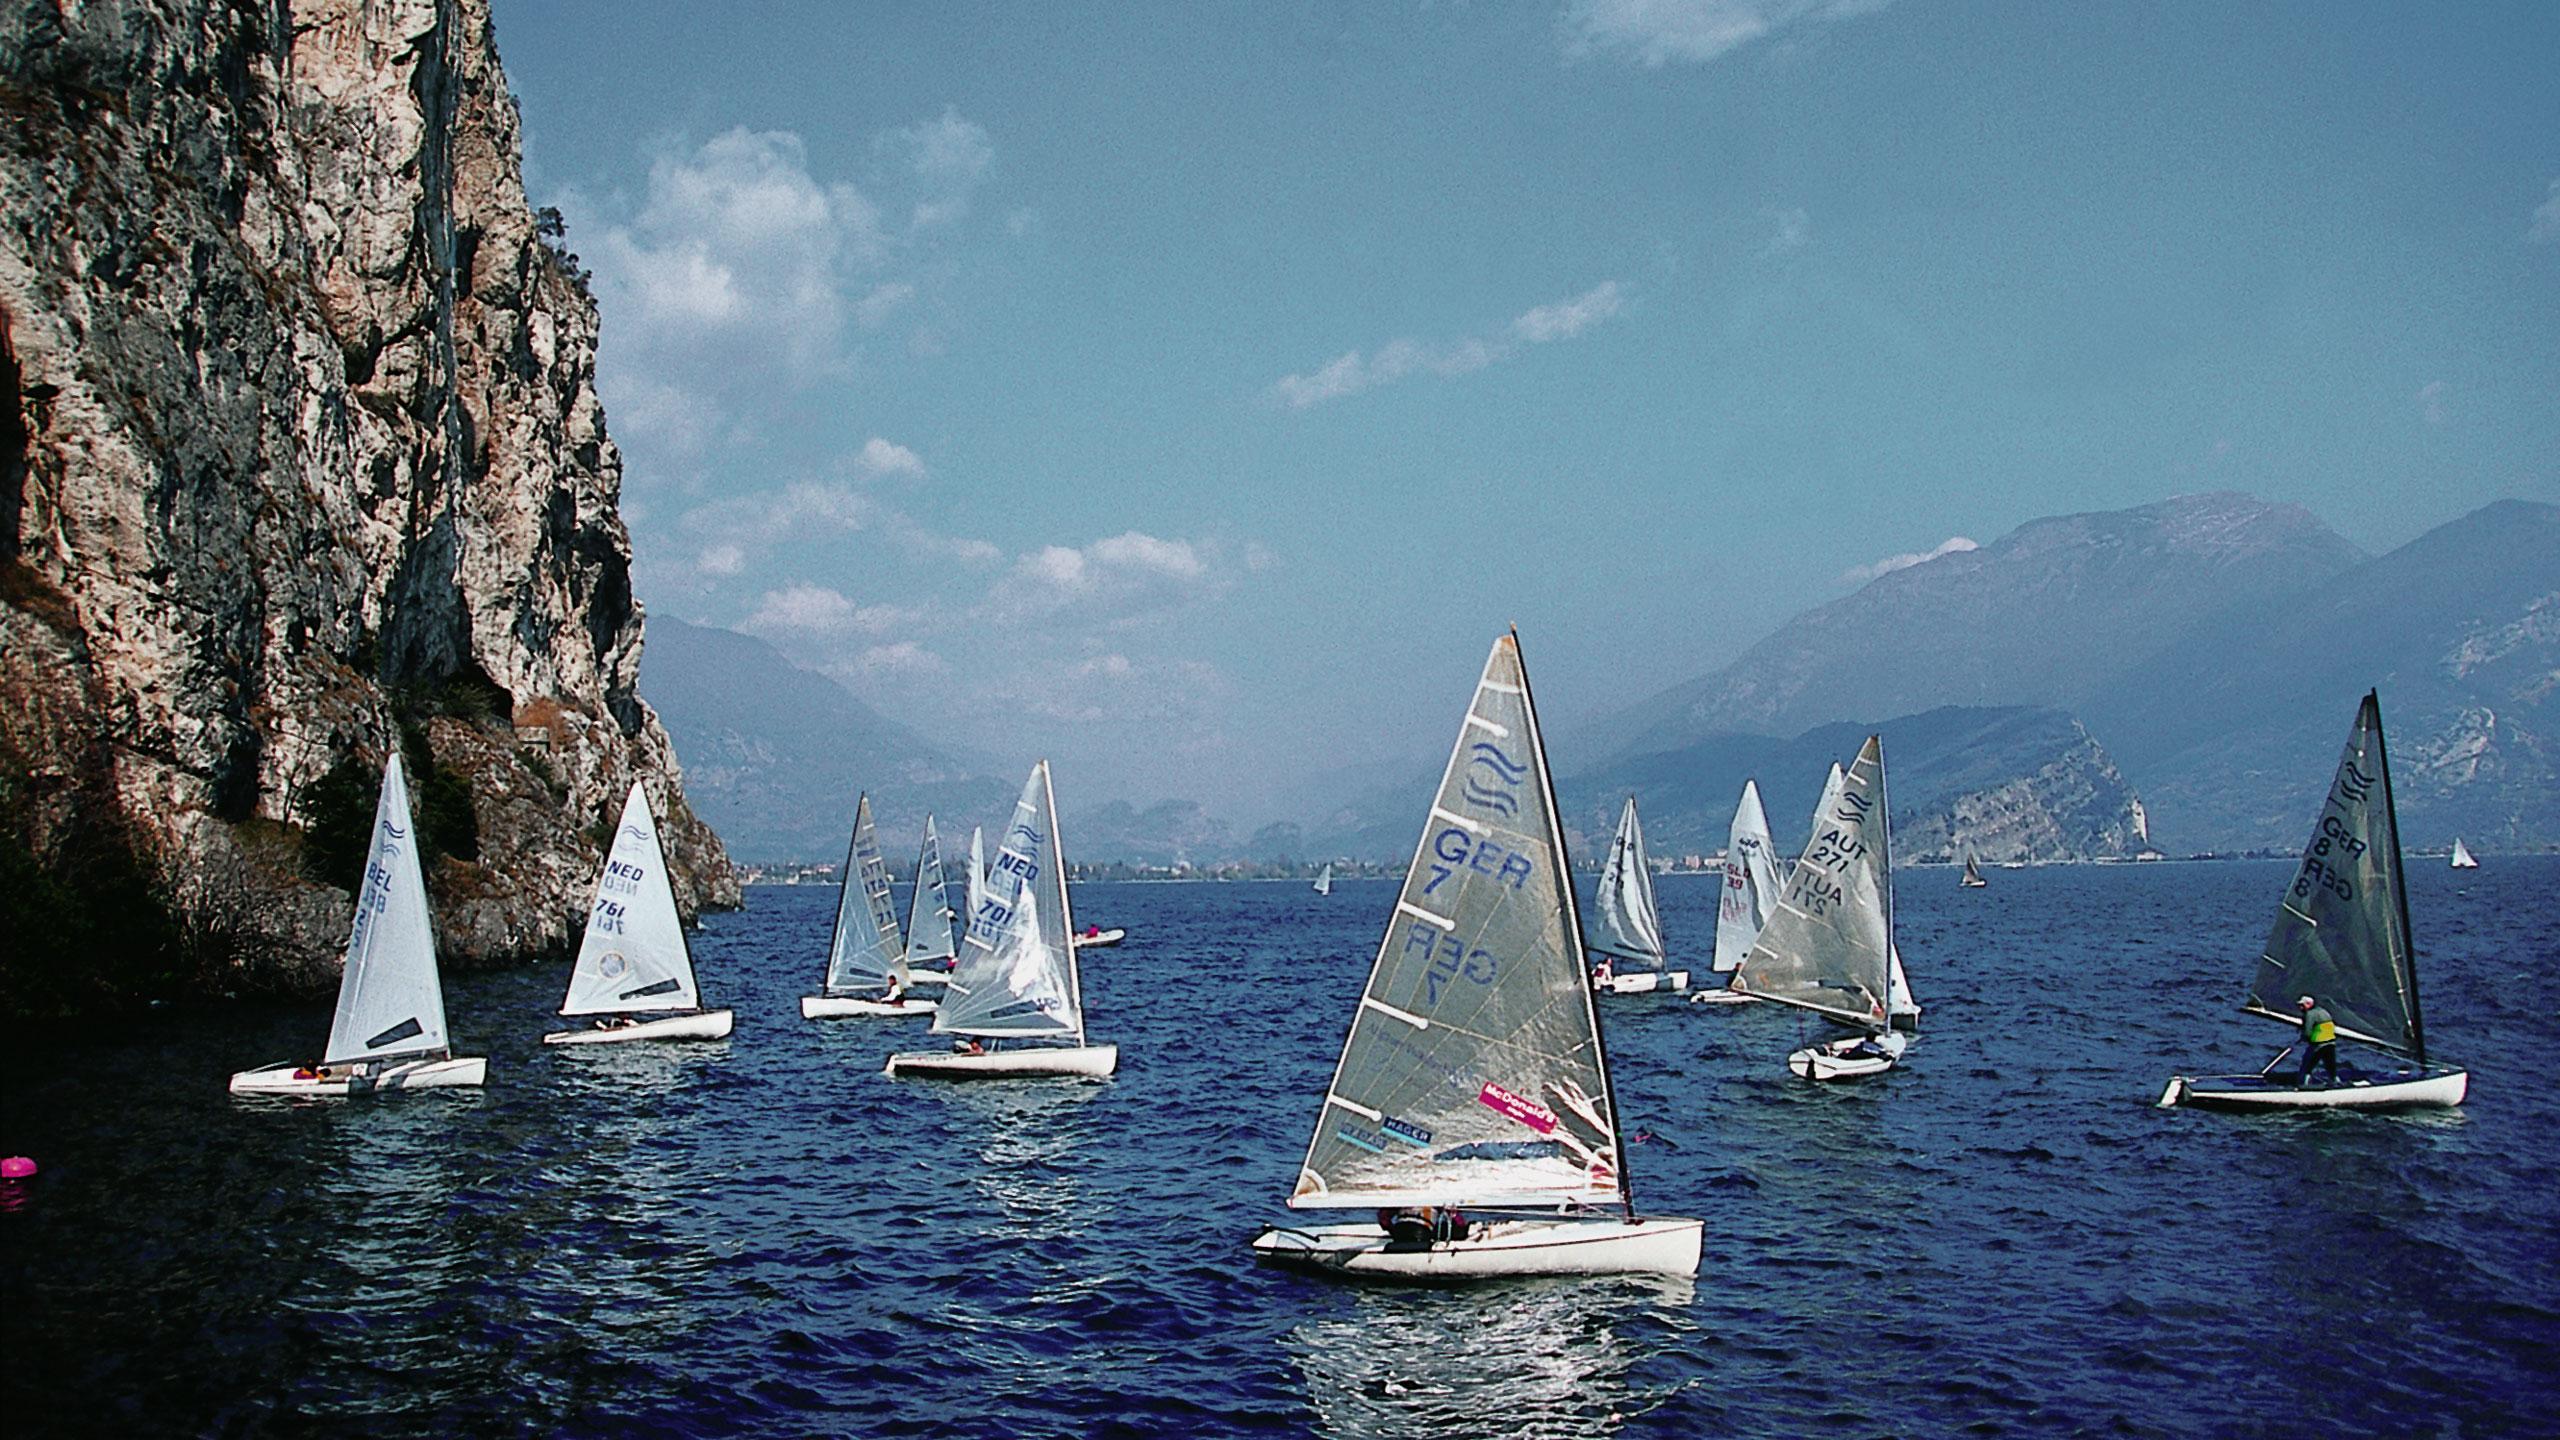 Parc Hotels Italia & Resorts nad Jeziorem Garda